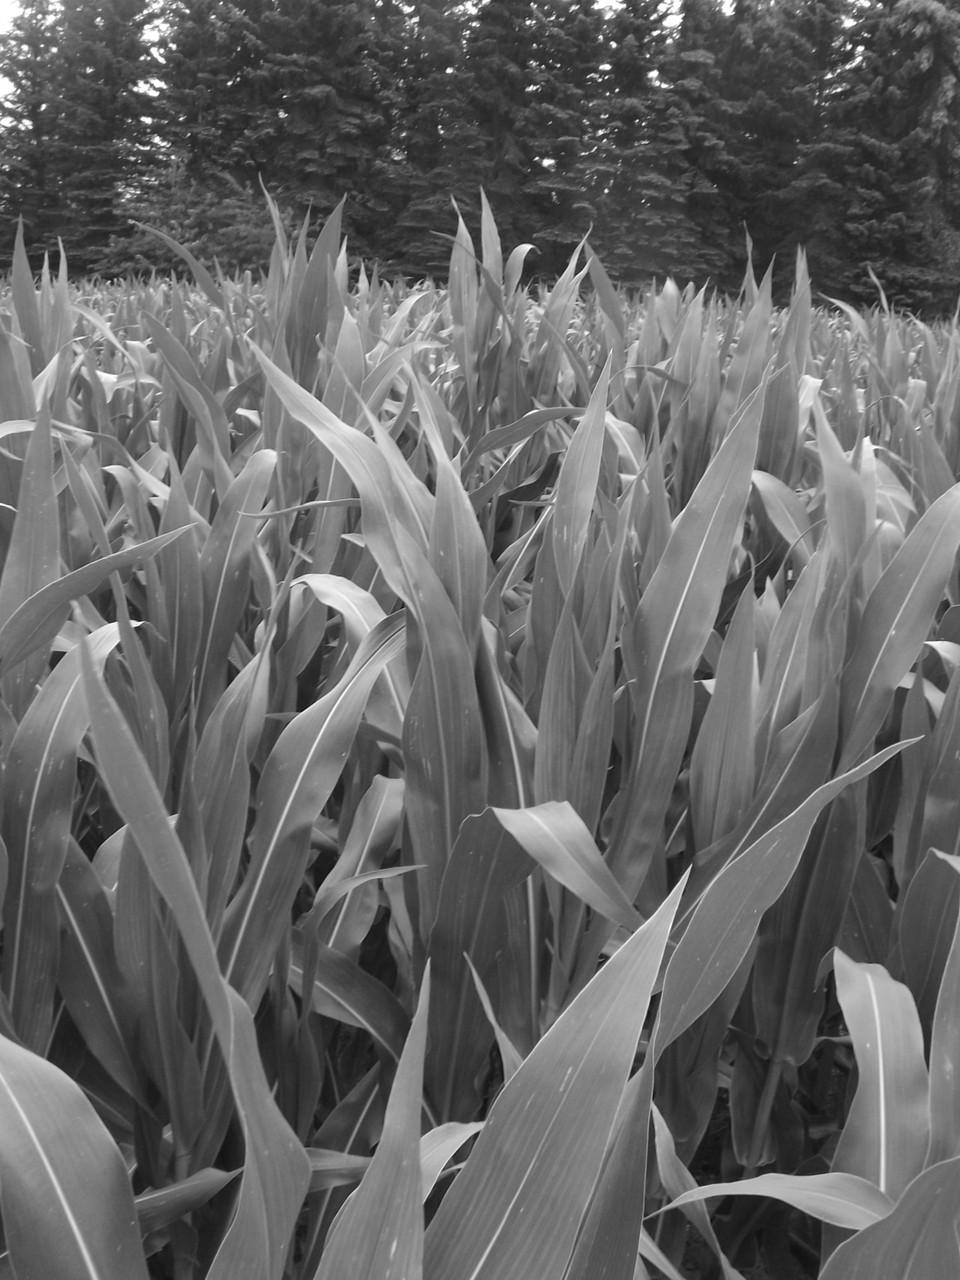 Maisfeld im Wachsen